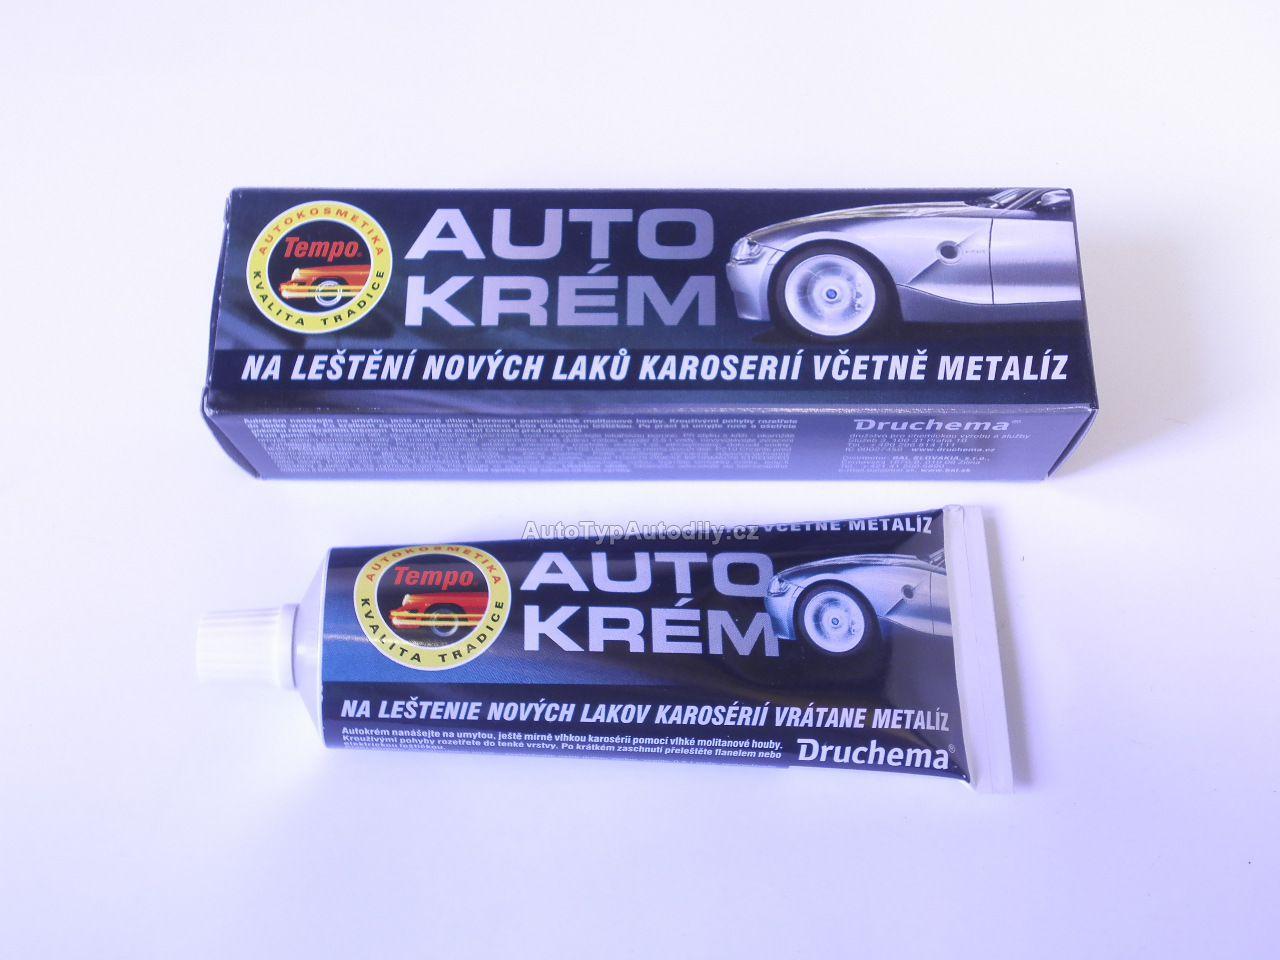 www.autotypautodily.cz Tempo,nové laky- autokrém 120g